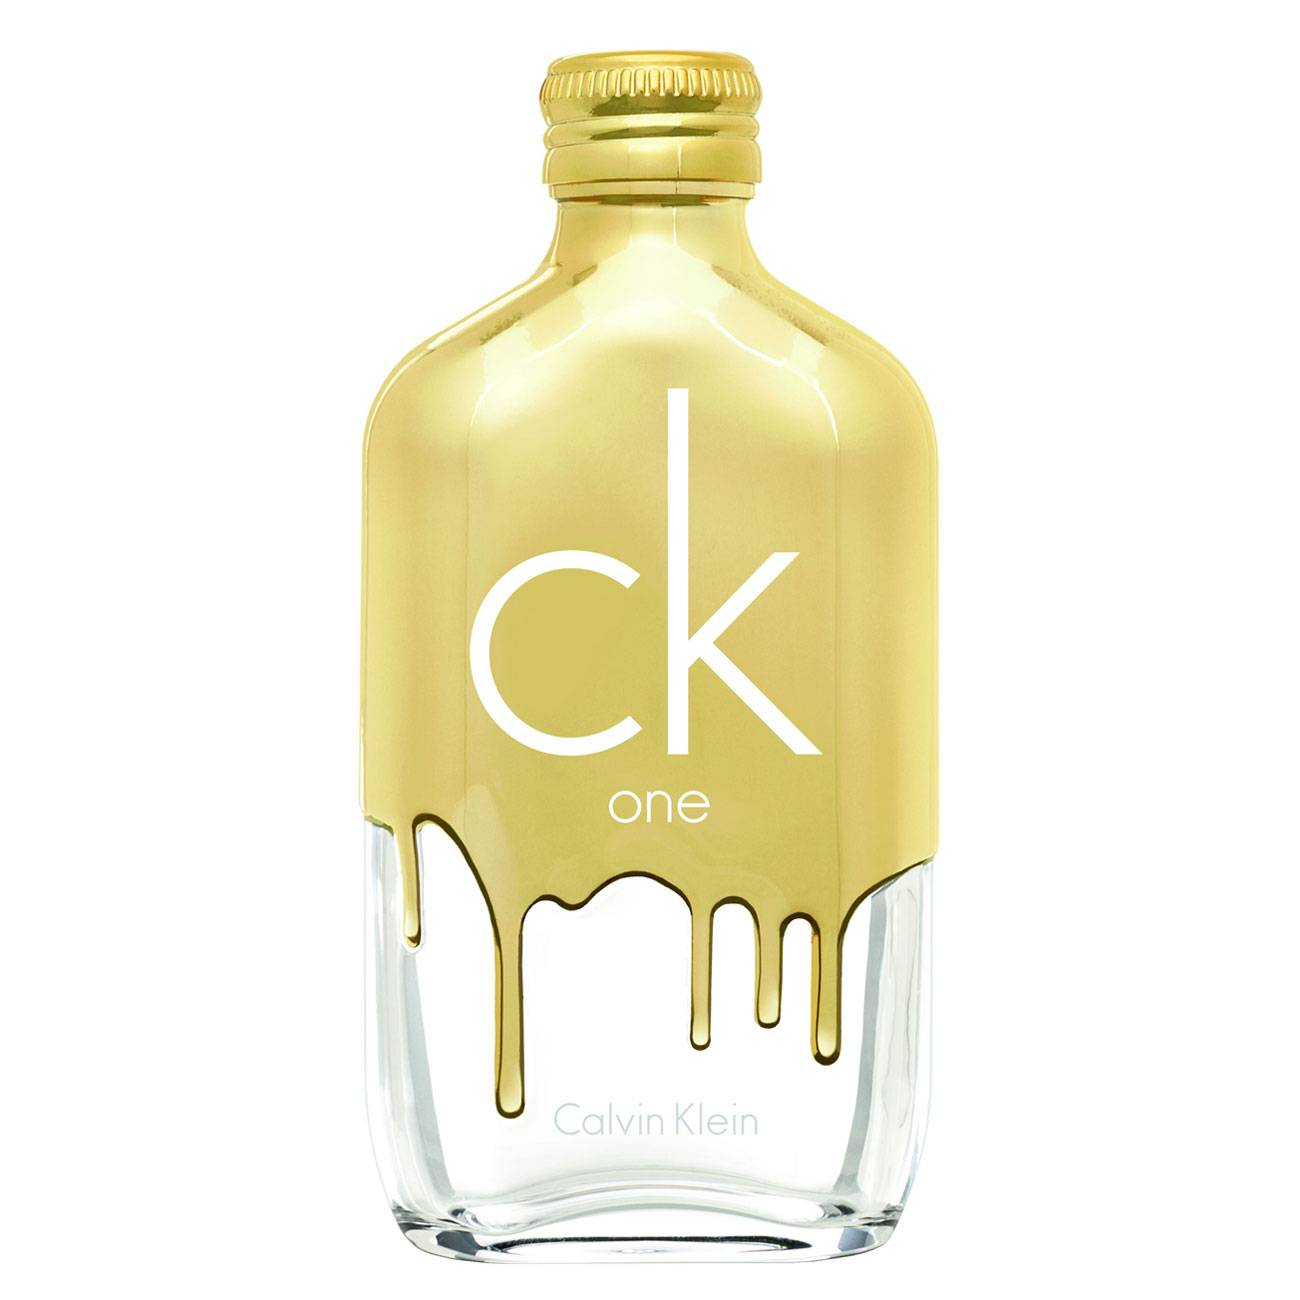 One Gold 200ml Calvin Klein imagine 2021 bestvalue.eu